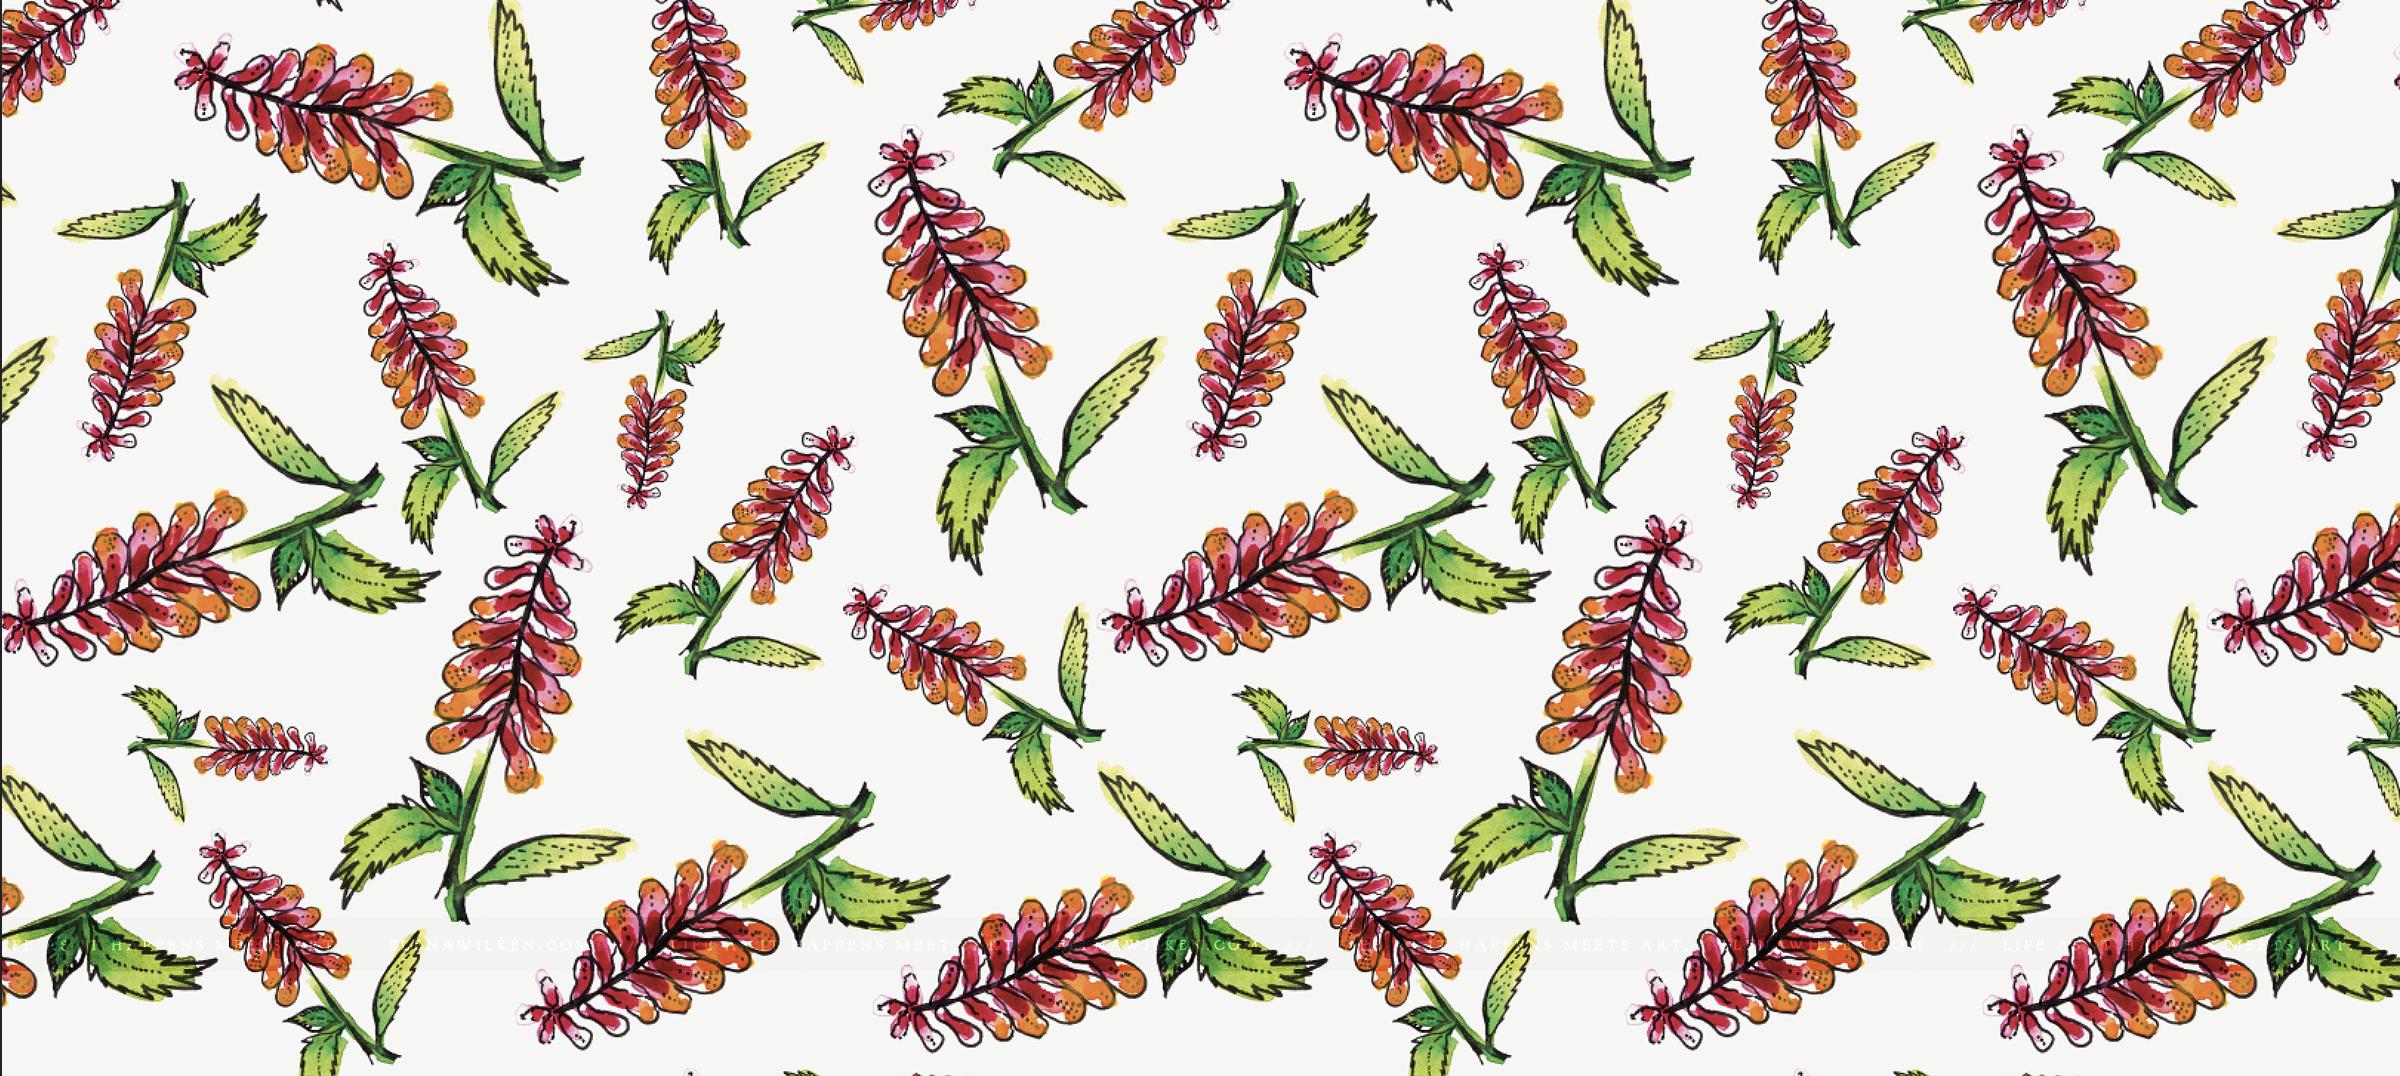 elena-wilken-whimsical-watercolor-fields-surface-pattern-design6.png